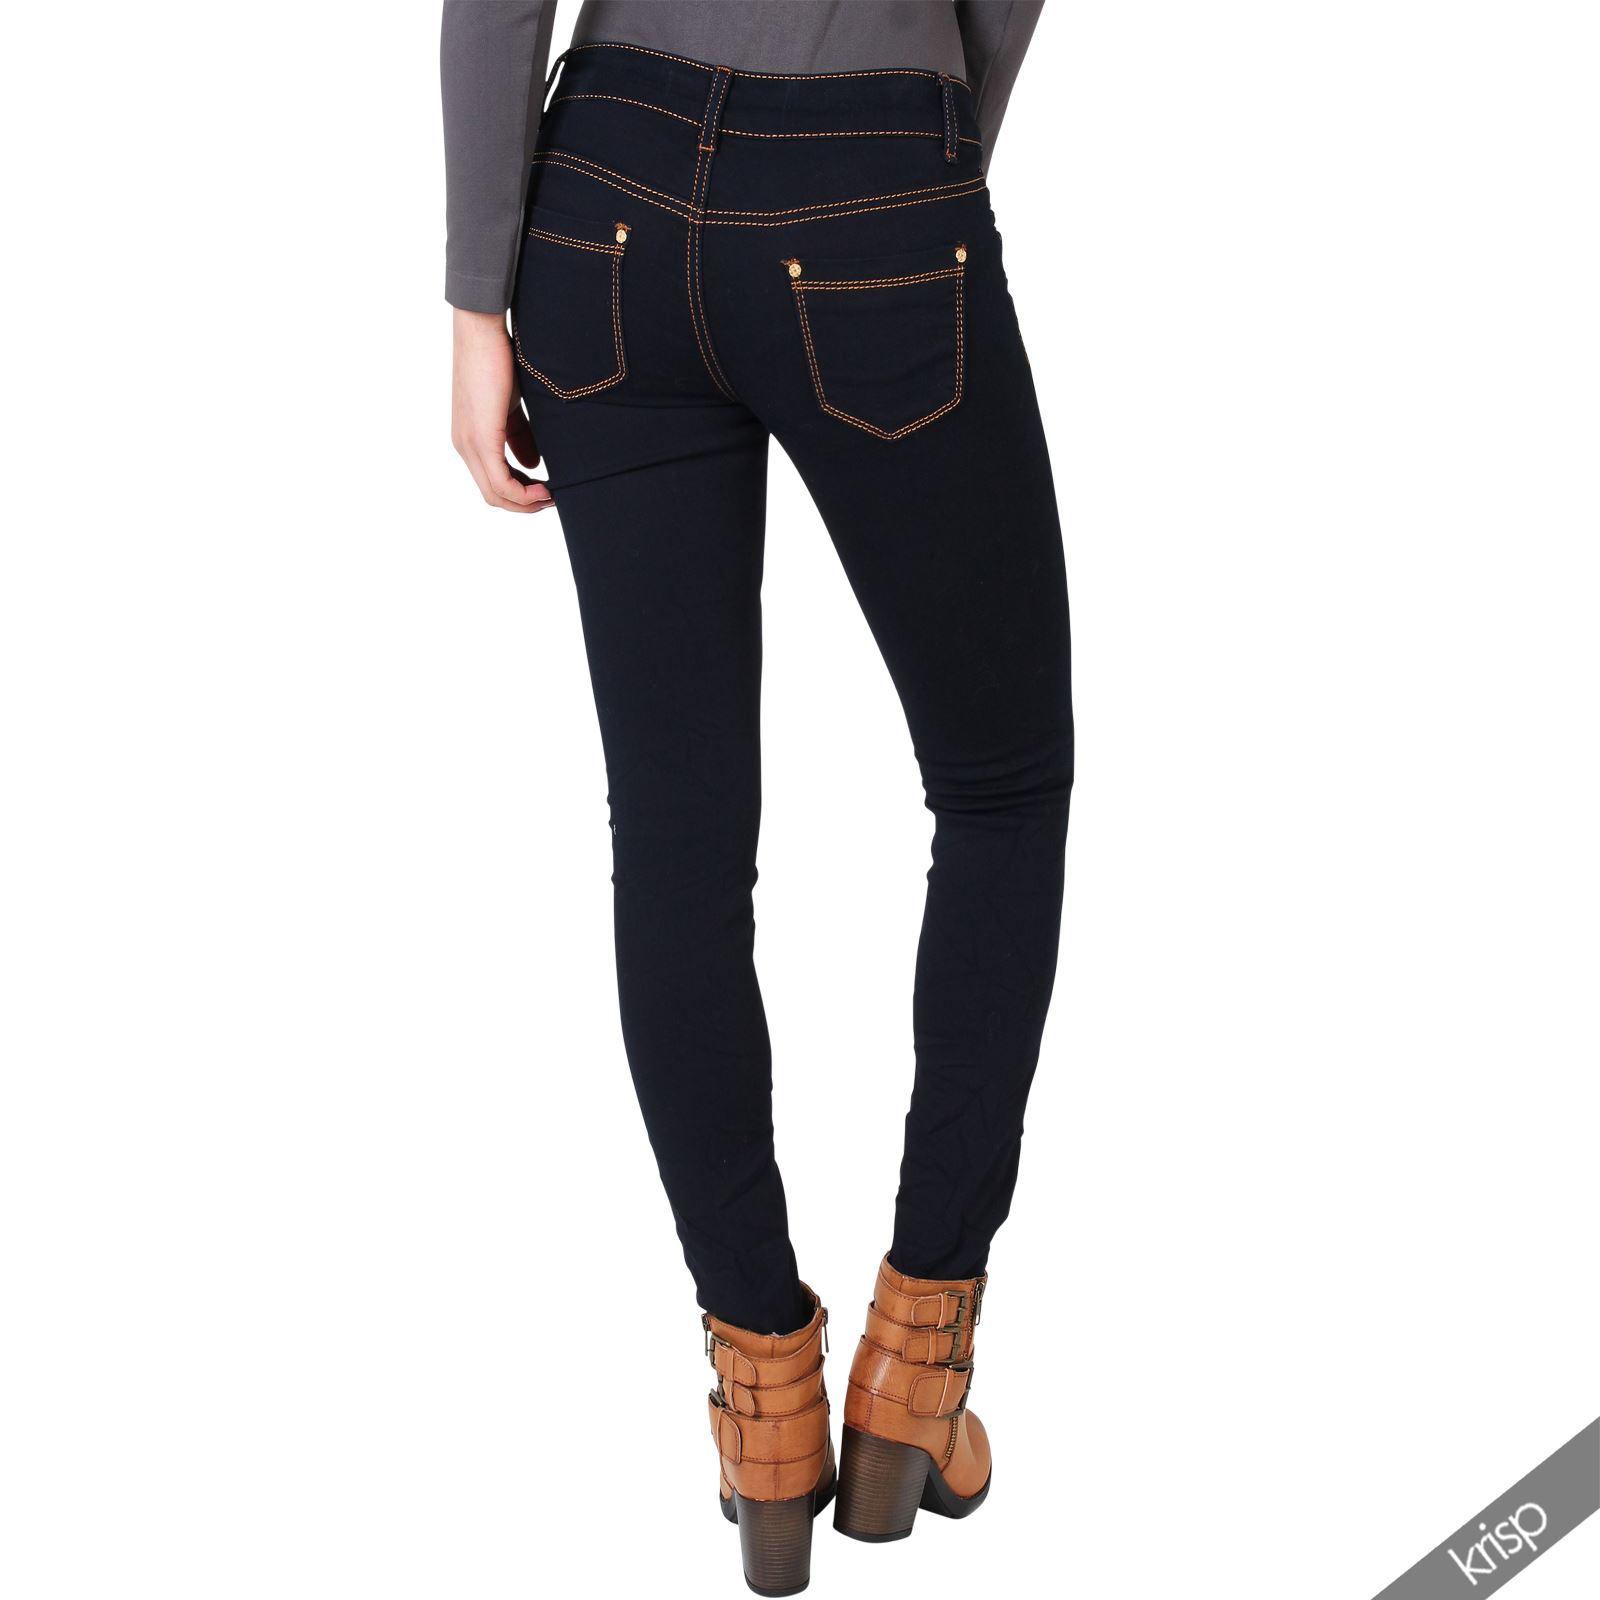 Awesome Womens Long Zipper Jogger Pants  Converse US